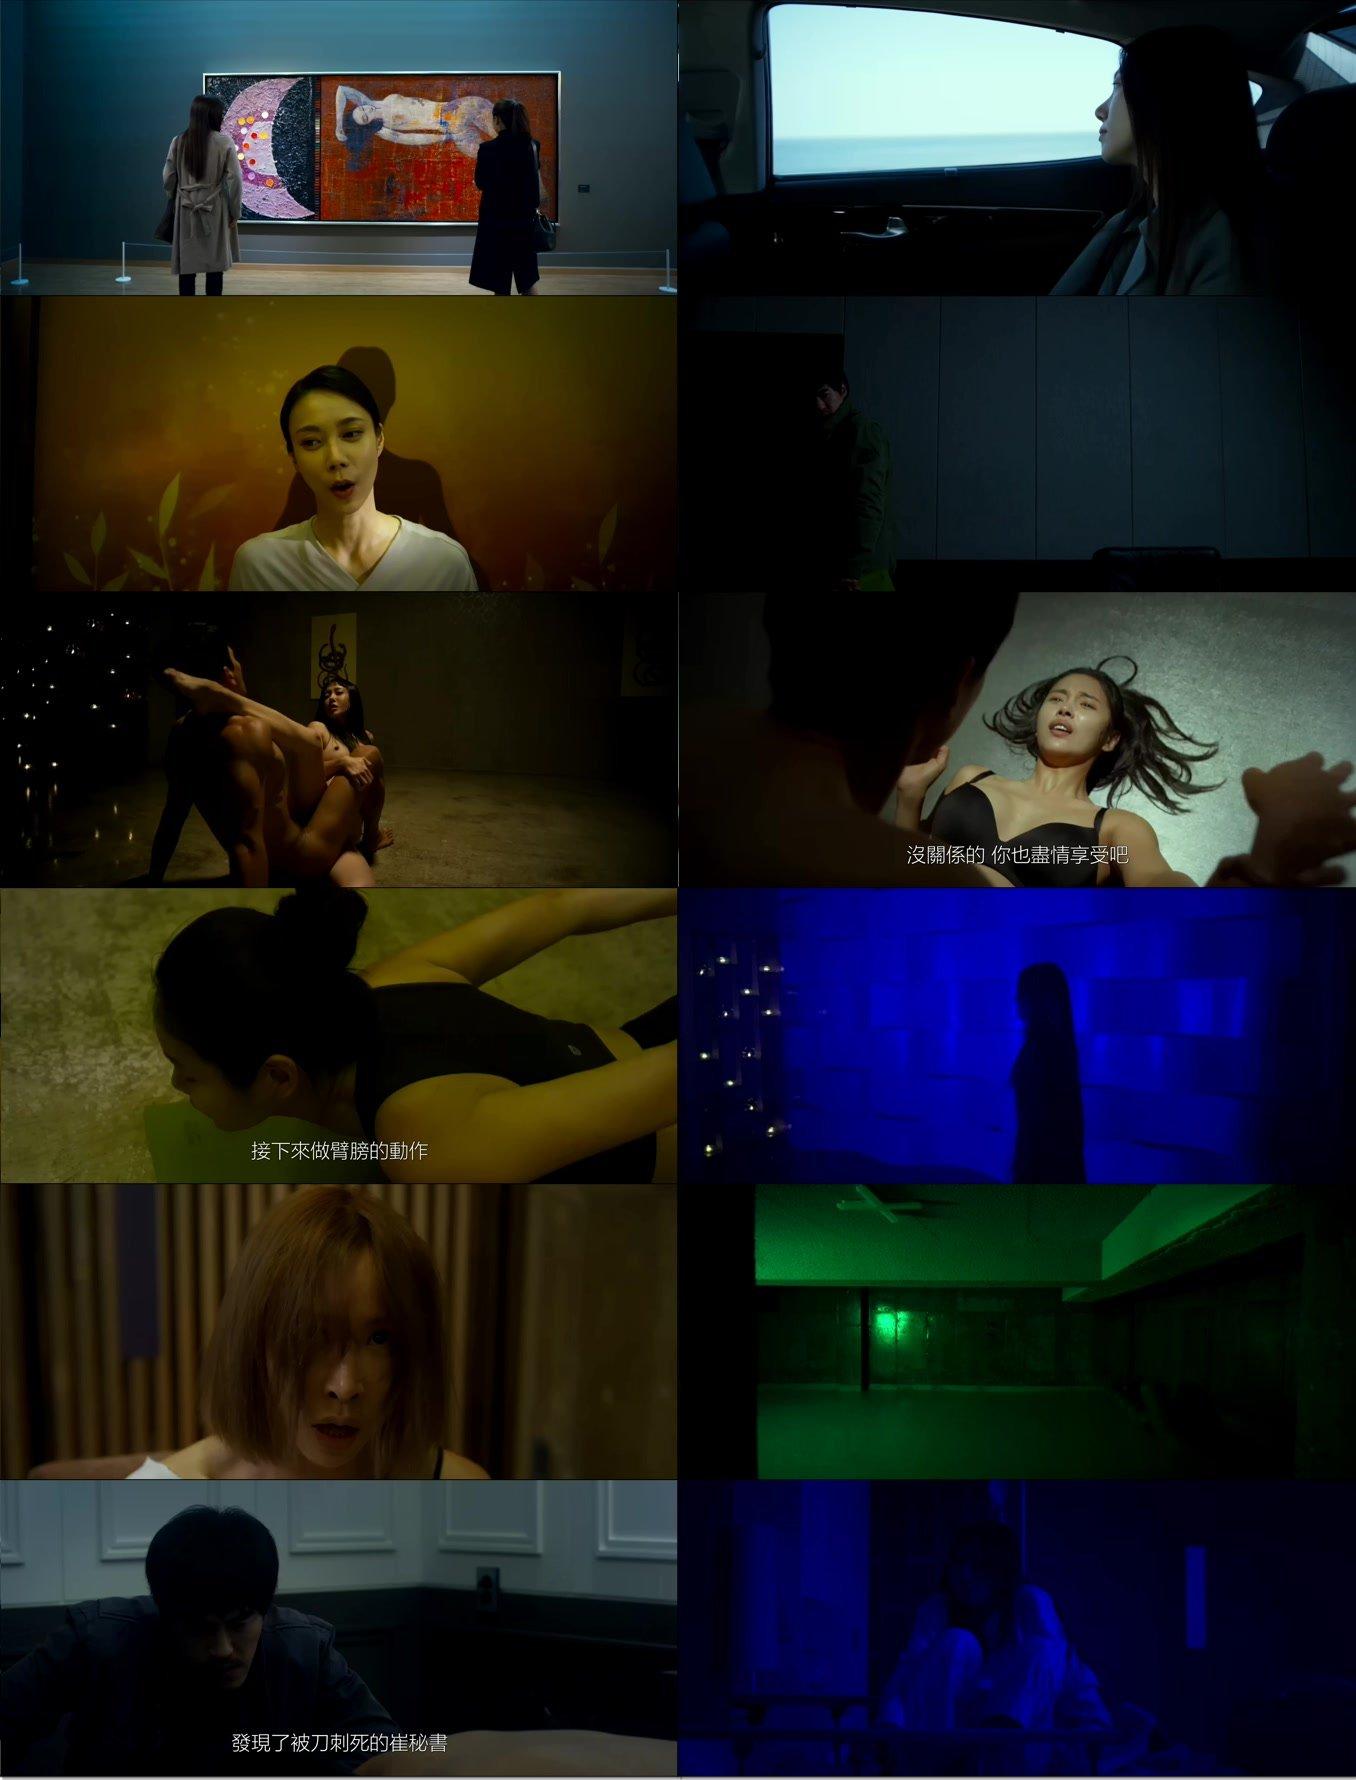 [x4][韓國]名偵探奶奶|瑜珈怨|鬼神拍檔.1080p[繁簡英]